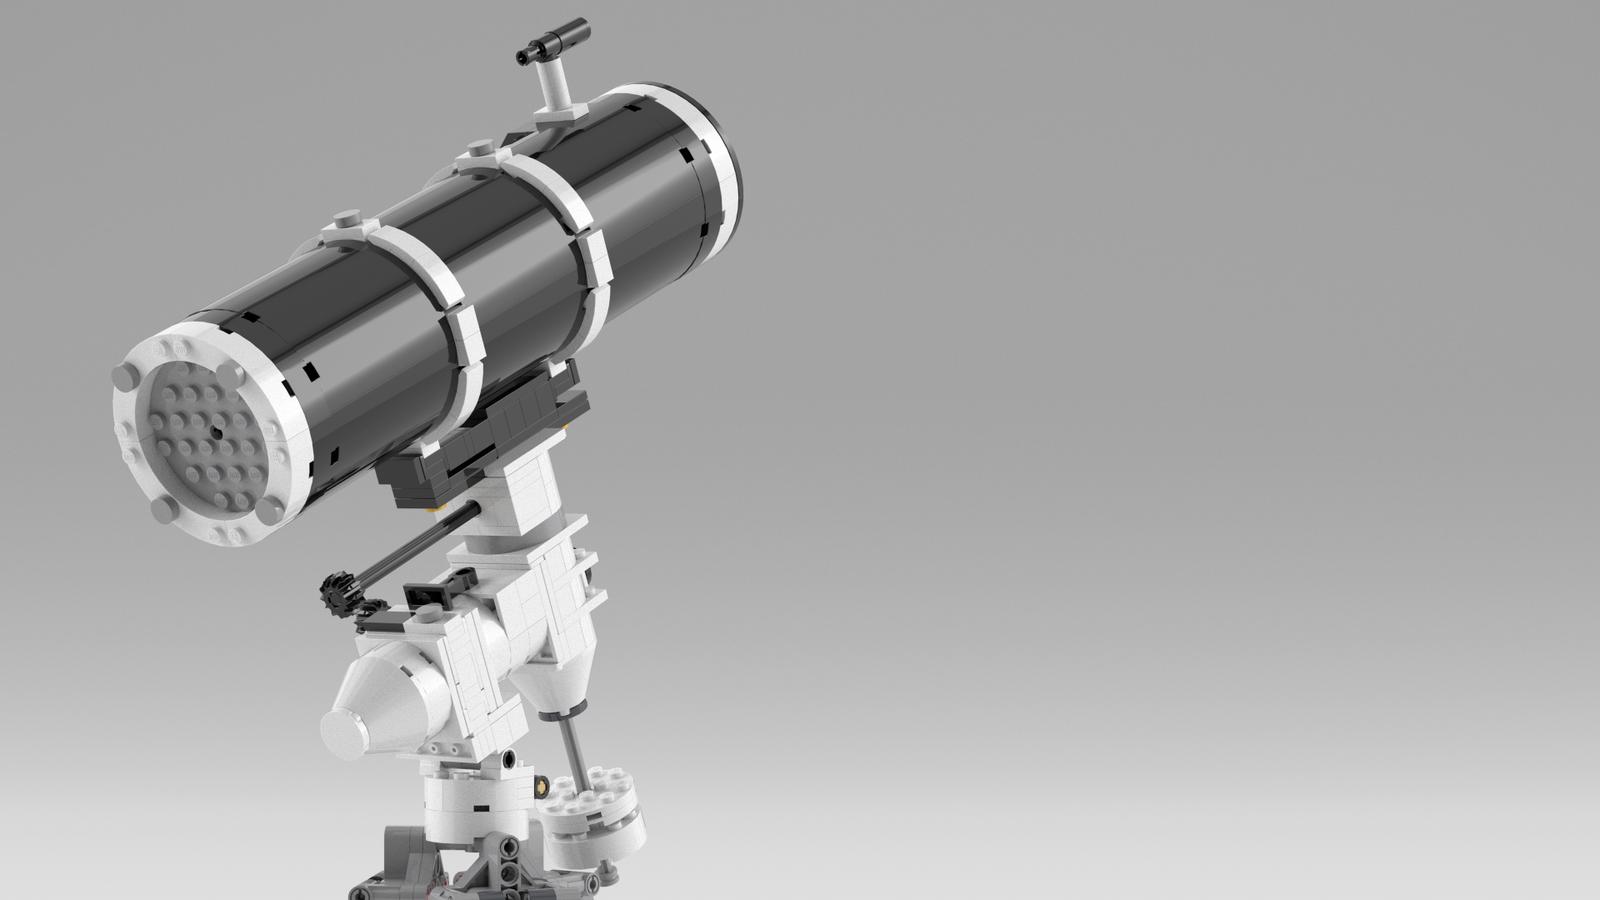 Focus camera celestron astro fi mm newtonian reflector